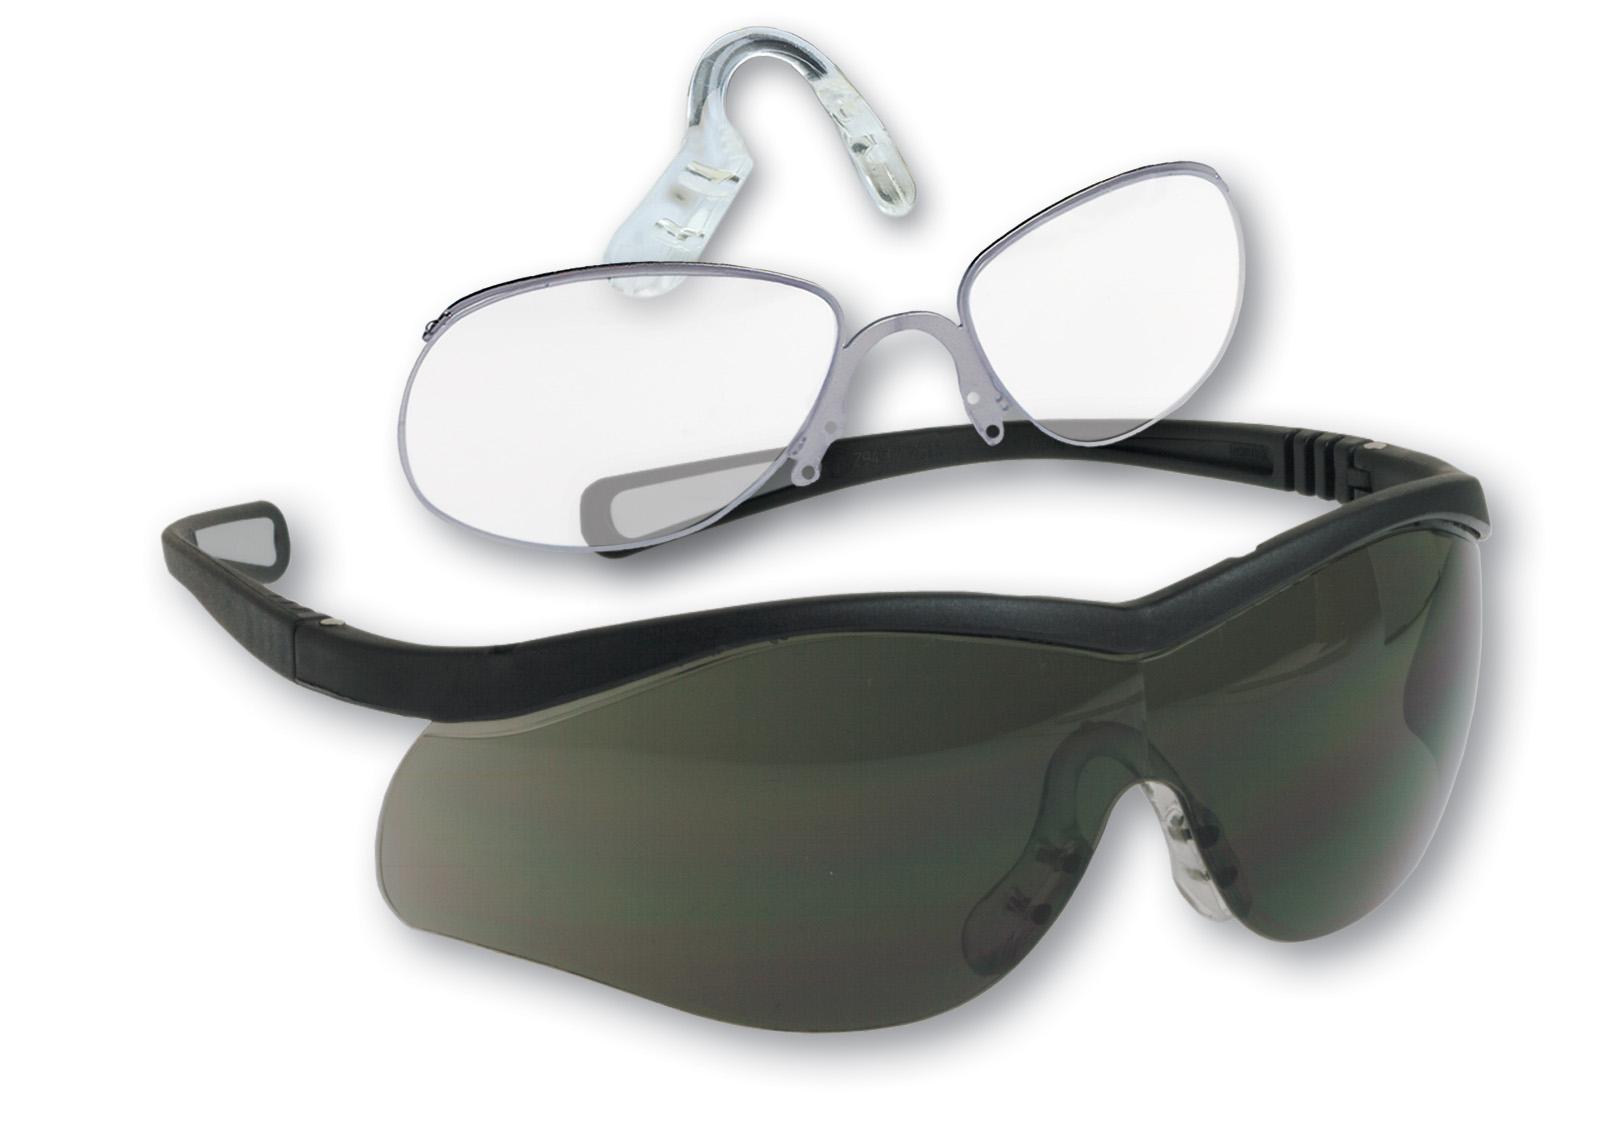 cc4ad6eb17 North Lightning™ Series Ergonomic Safety Eyewear